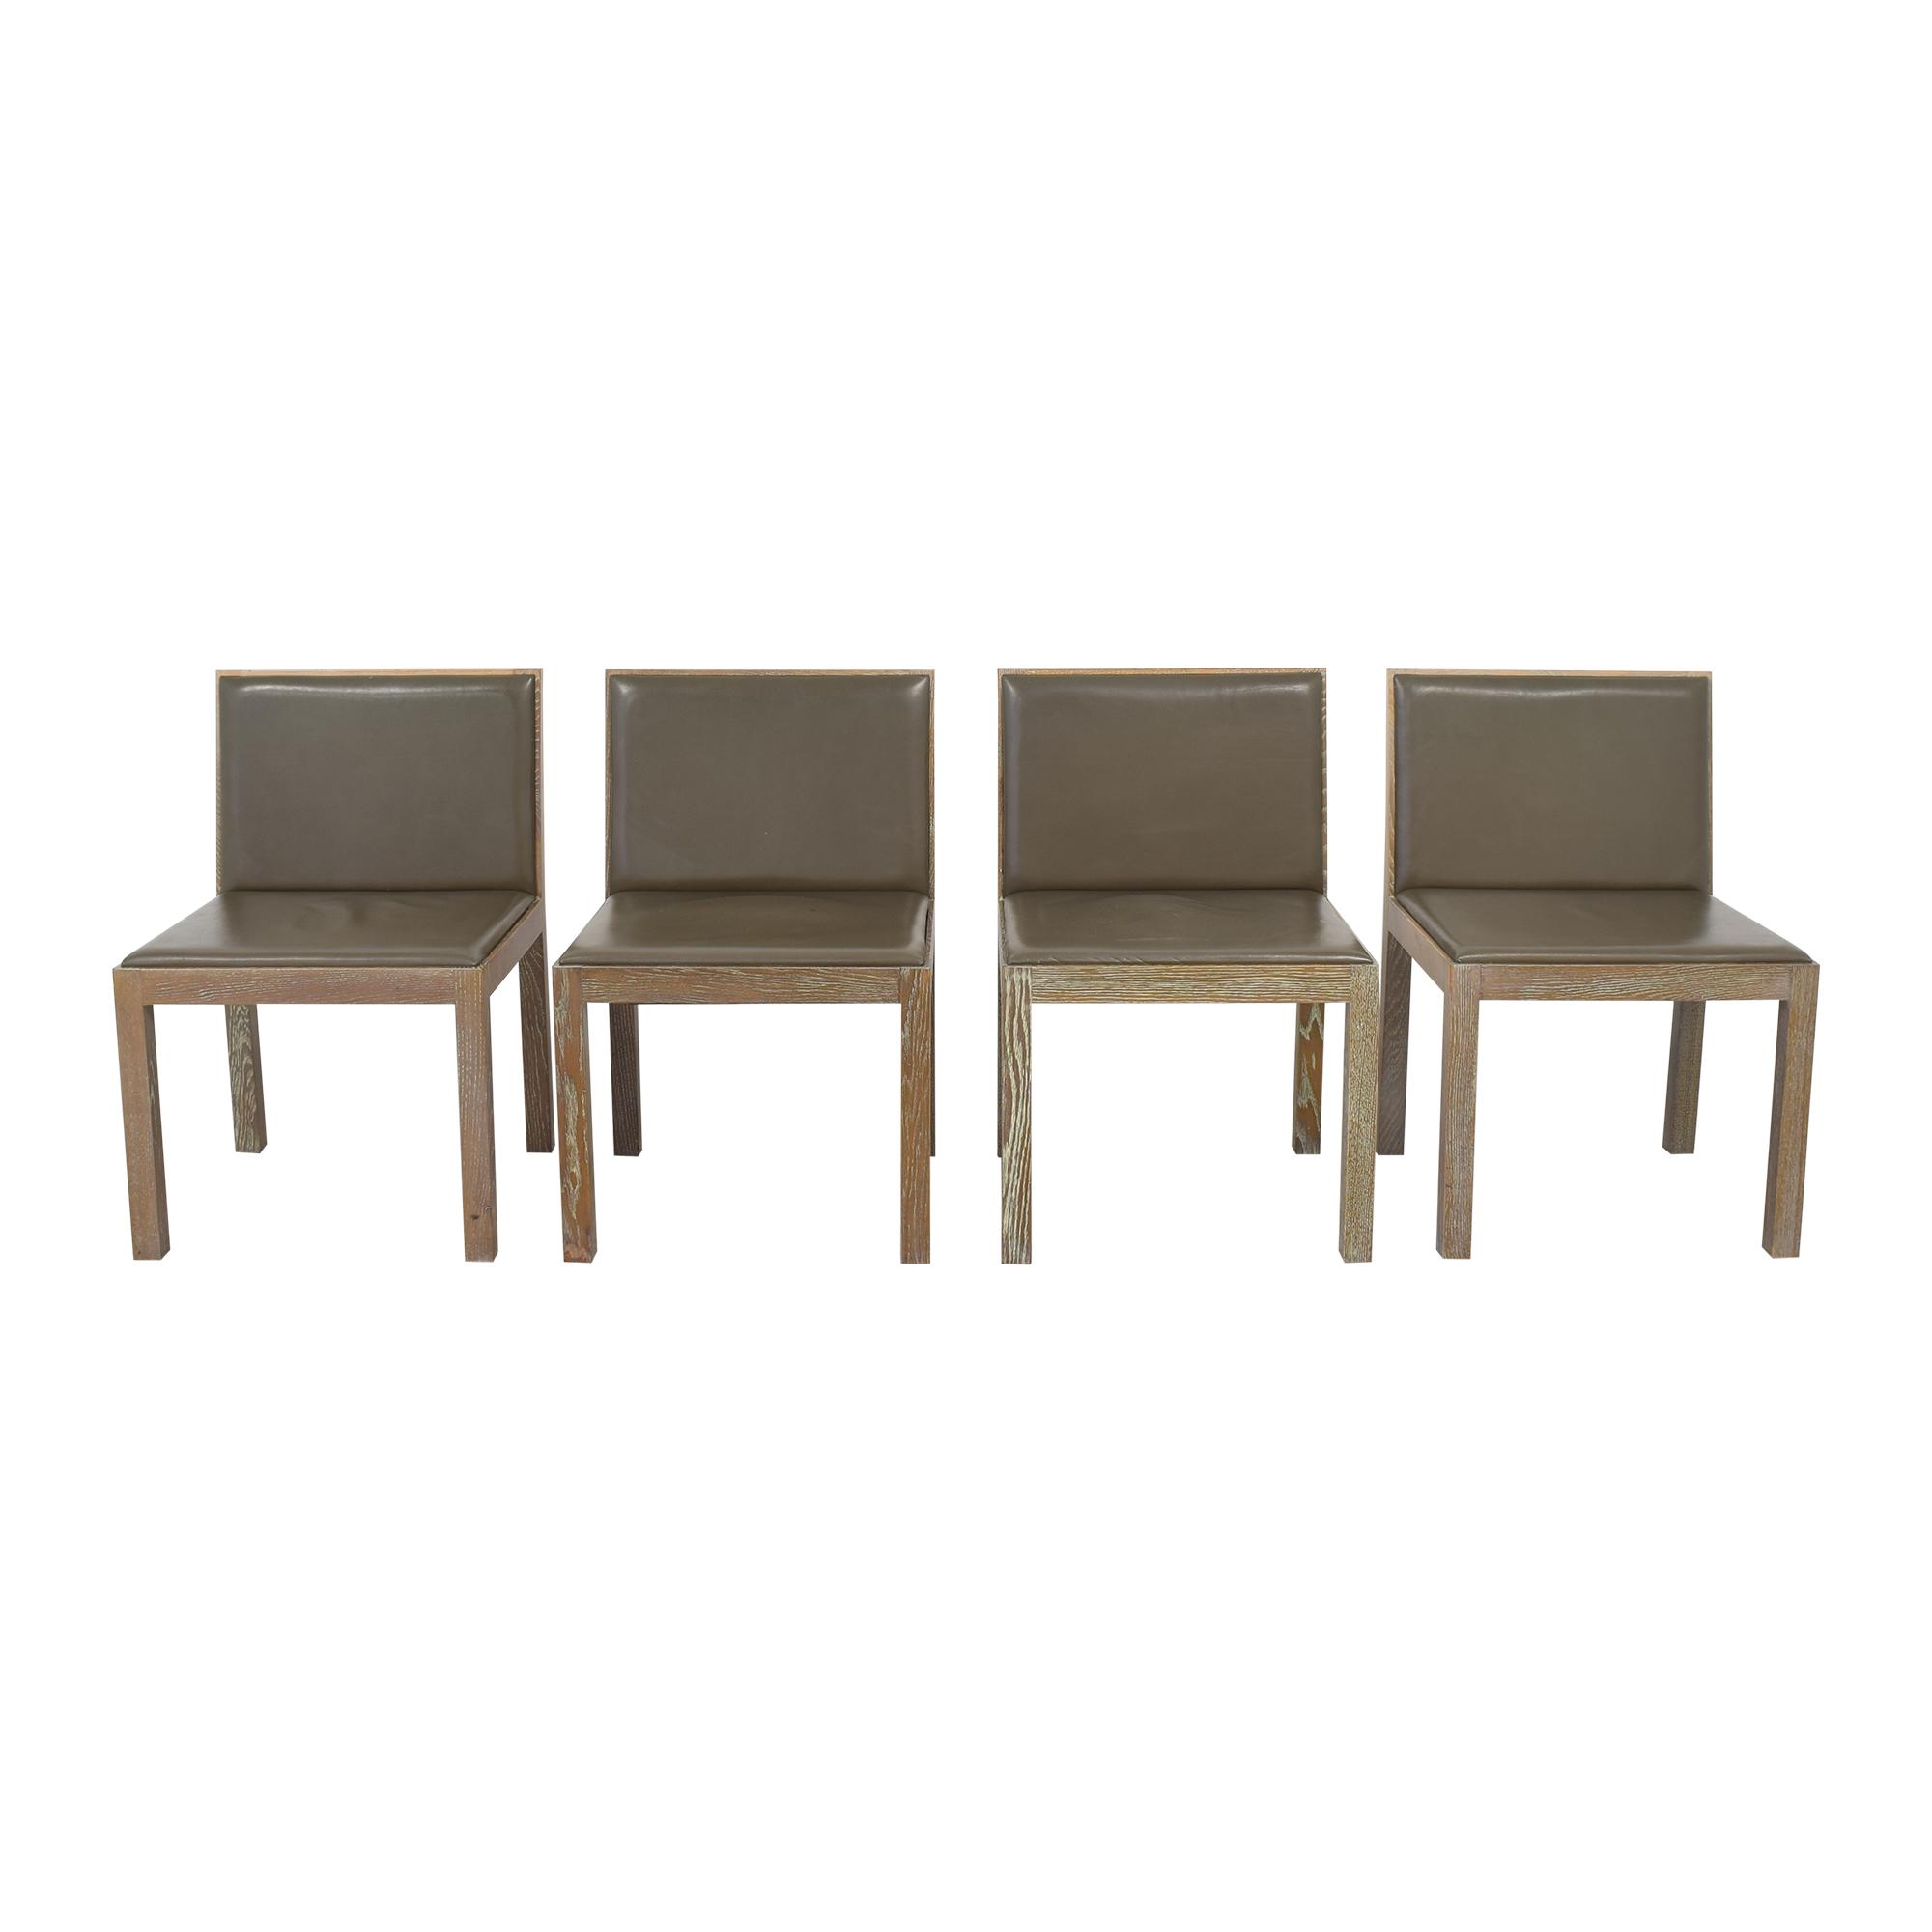 Armani Casa Armani Casa Dining Chairs discount